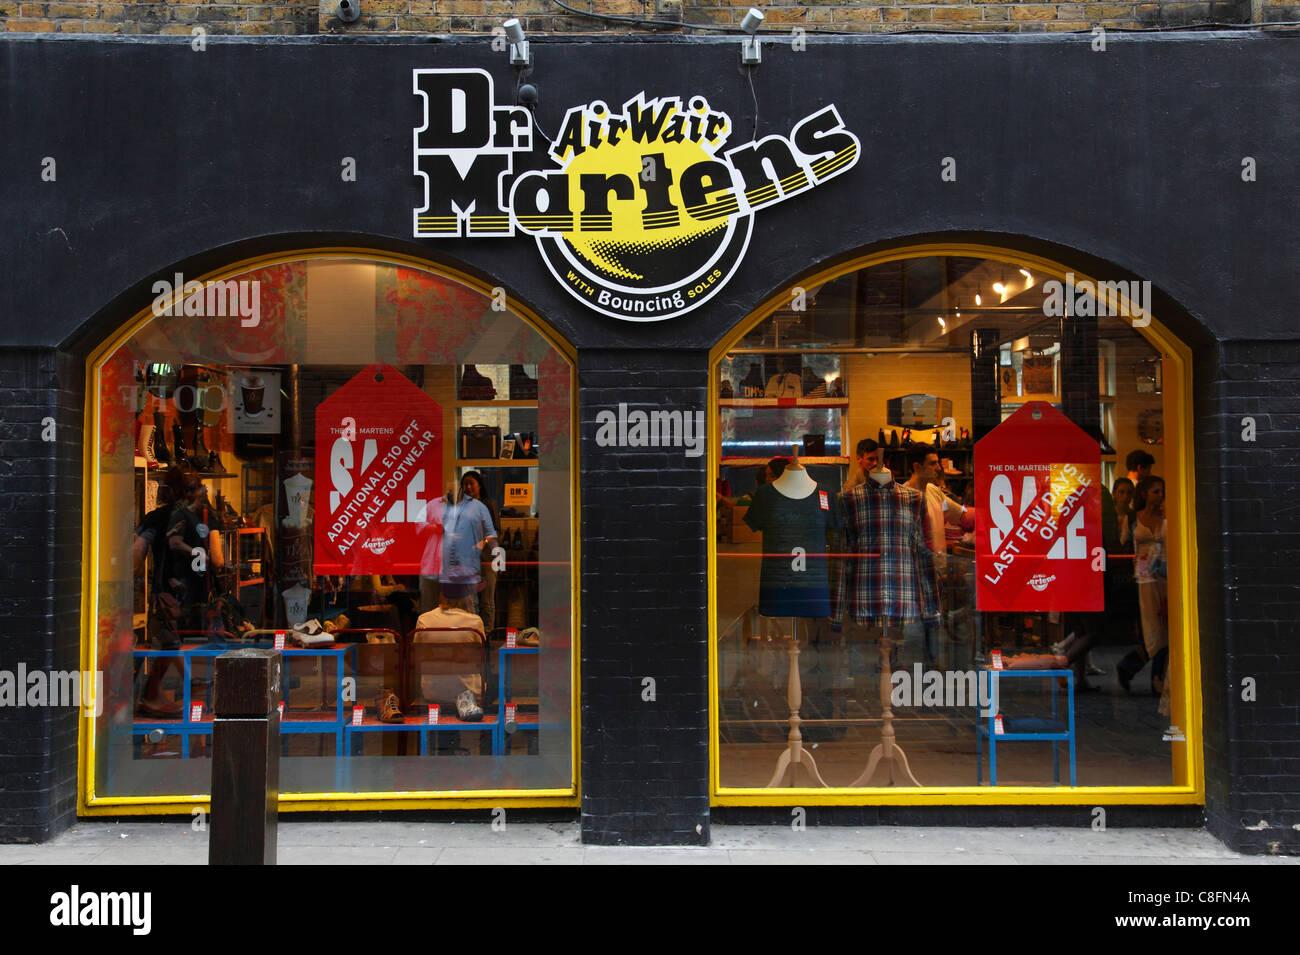 ee1da904cc A Dr Martens store in London, England, U.K Stock Photo: 39683850 - Alamy